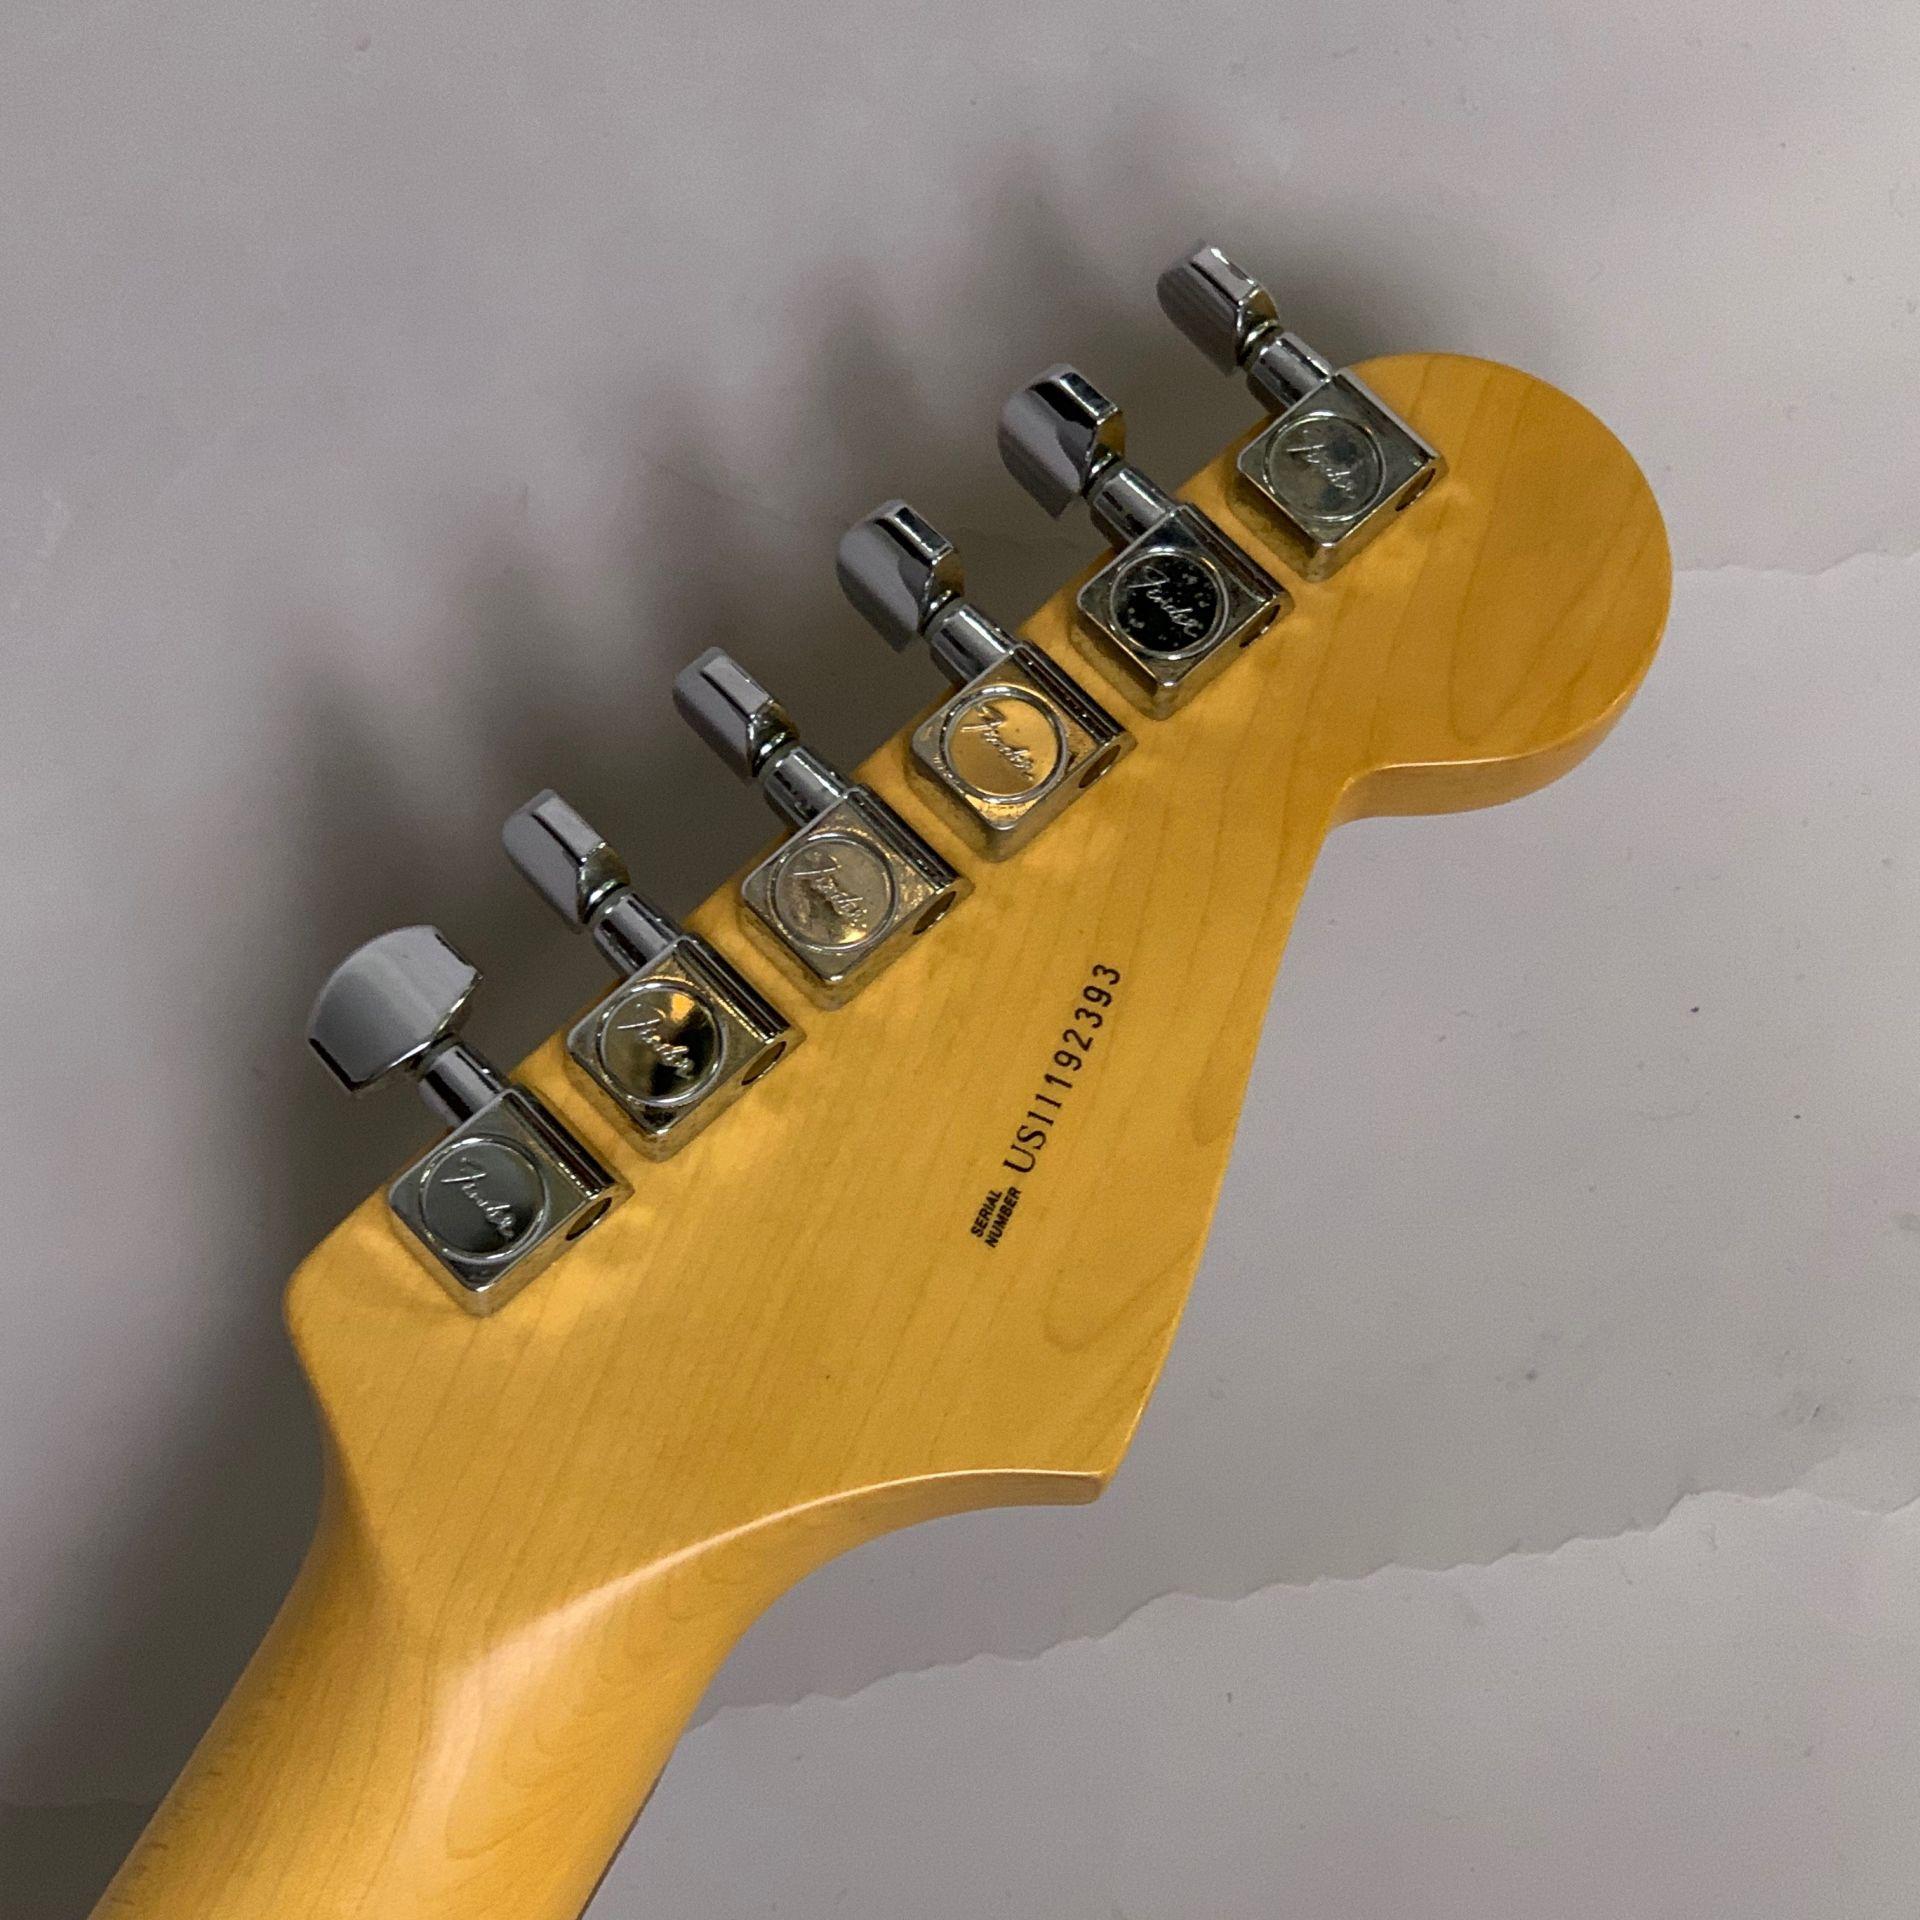 American Standard Stratcaster Lefthand 左利き レフティストラト アメスタの指板画像